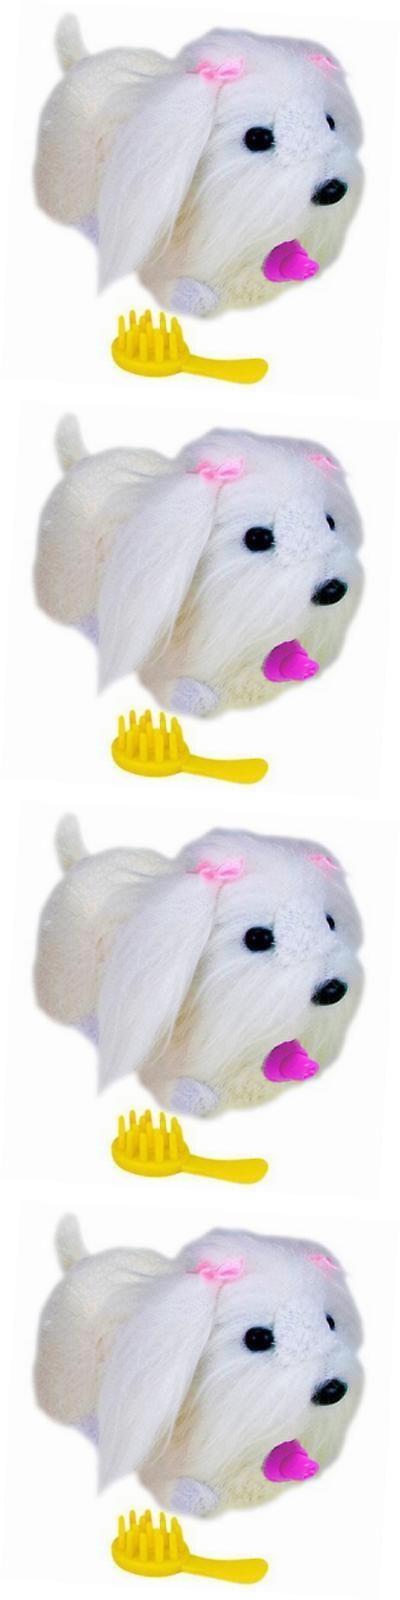 Zhu Zhu Pets 171529: Zhu Zhu Puppies Dog Sabrina - Maltese (White) -> BUY IT NOW ONLY: $49.96 on eBay!